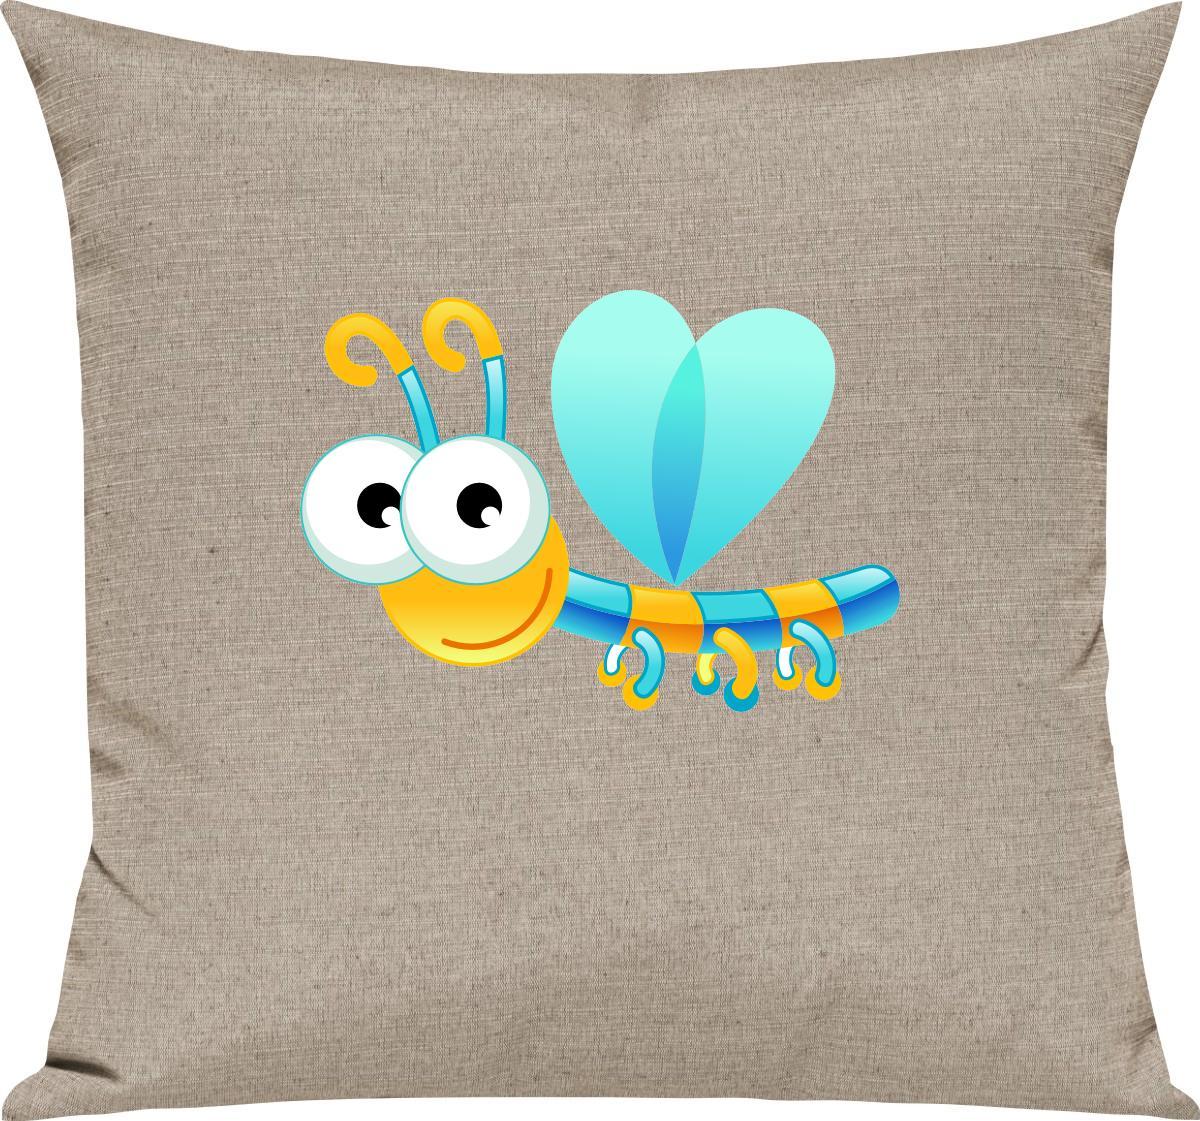 Indexbild 14 - Kinder Kissen, Libelle Insekt Tiere Tier Natur, Kuschelkissen Couch Deko,